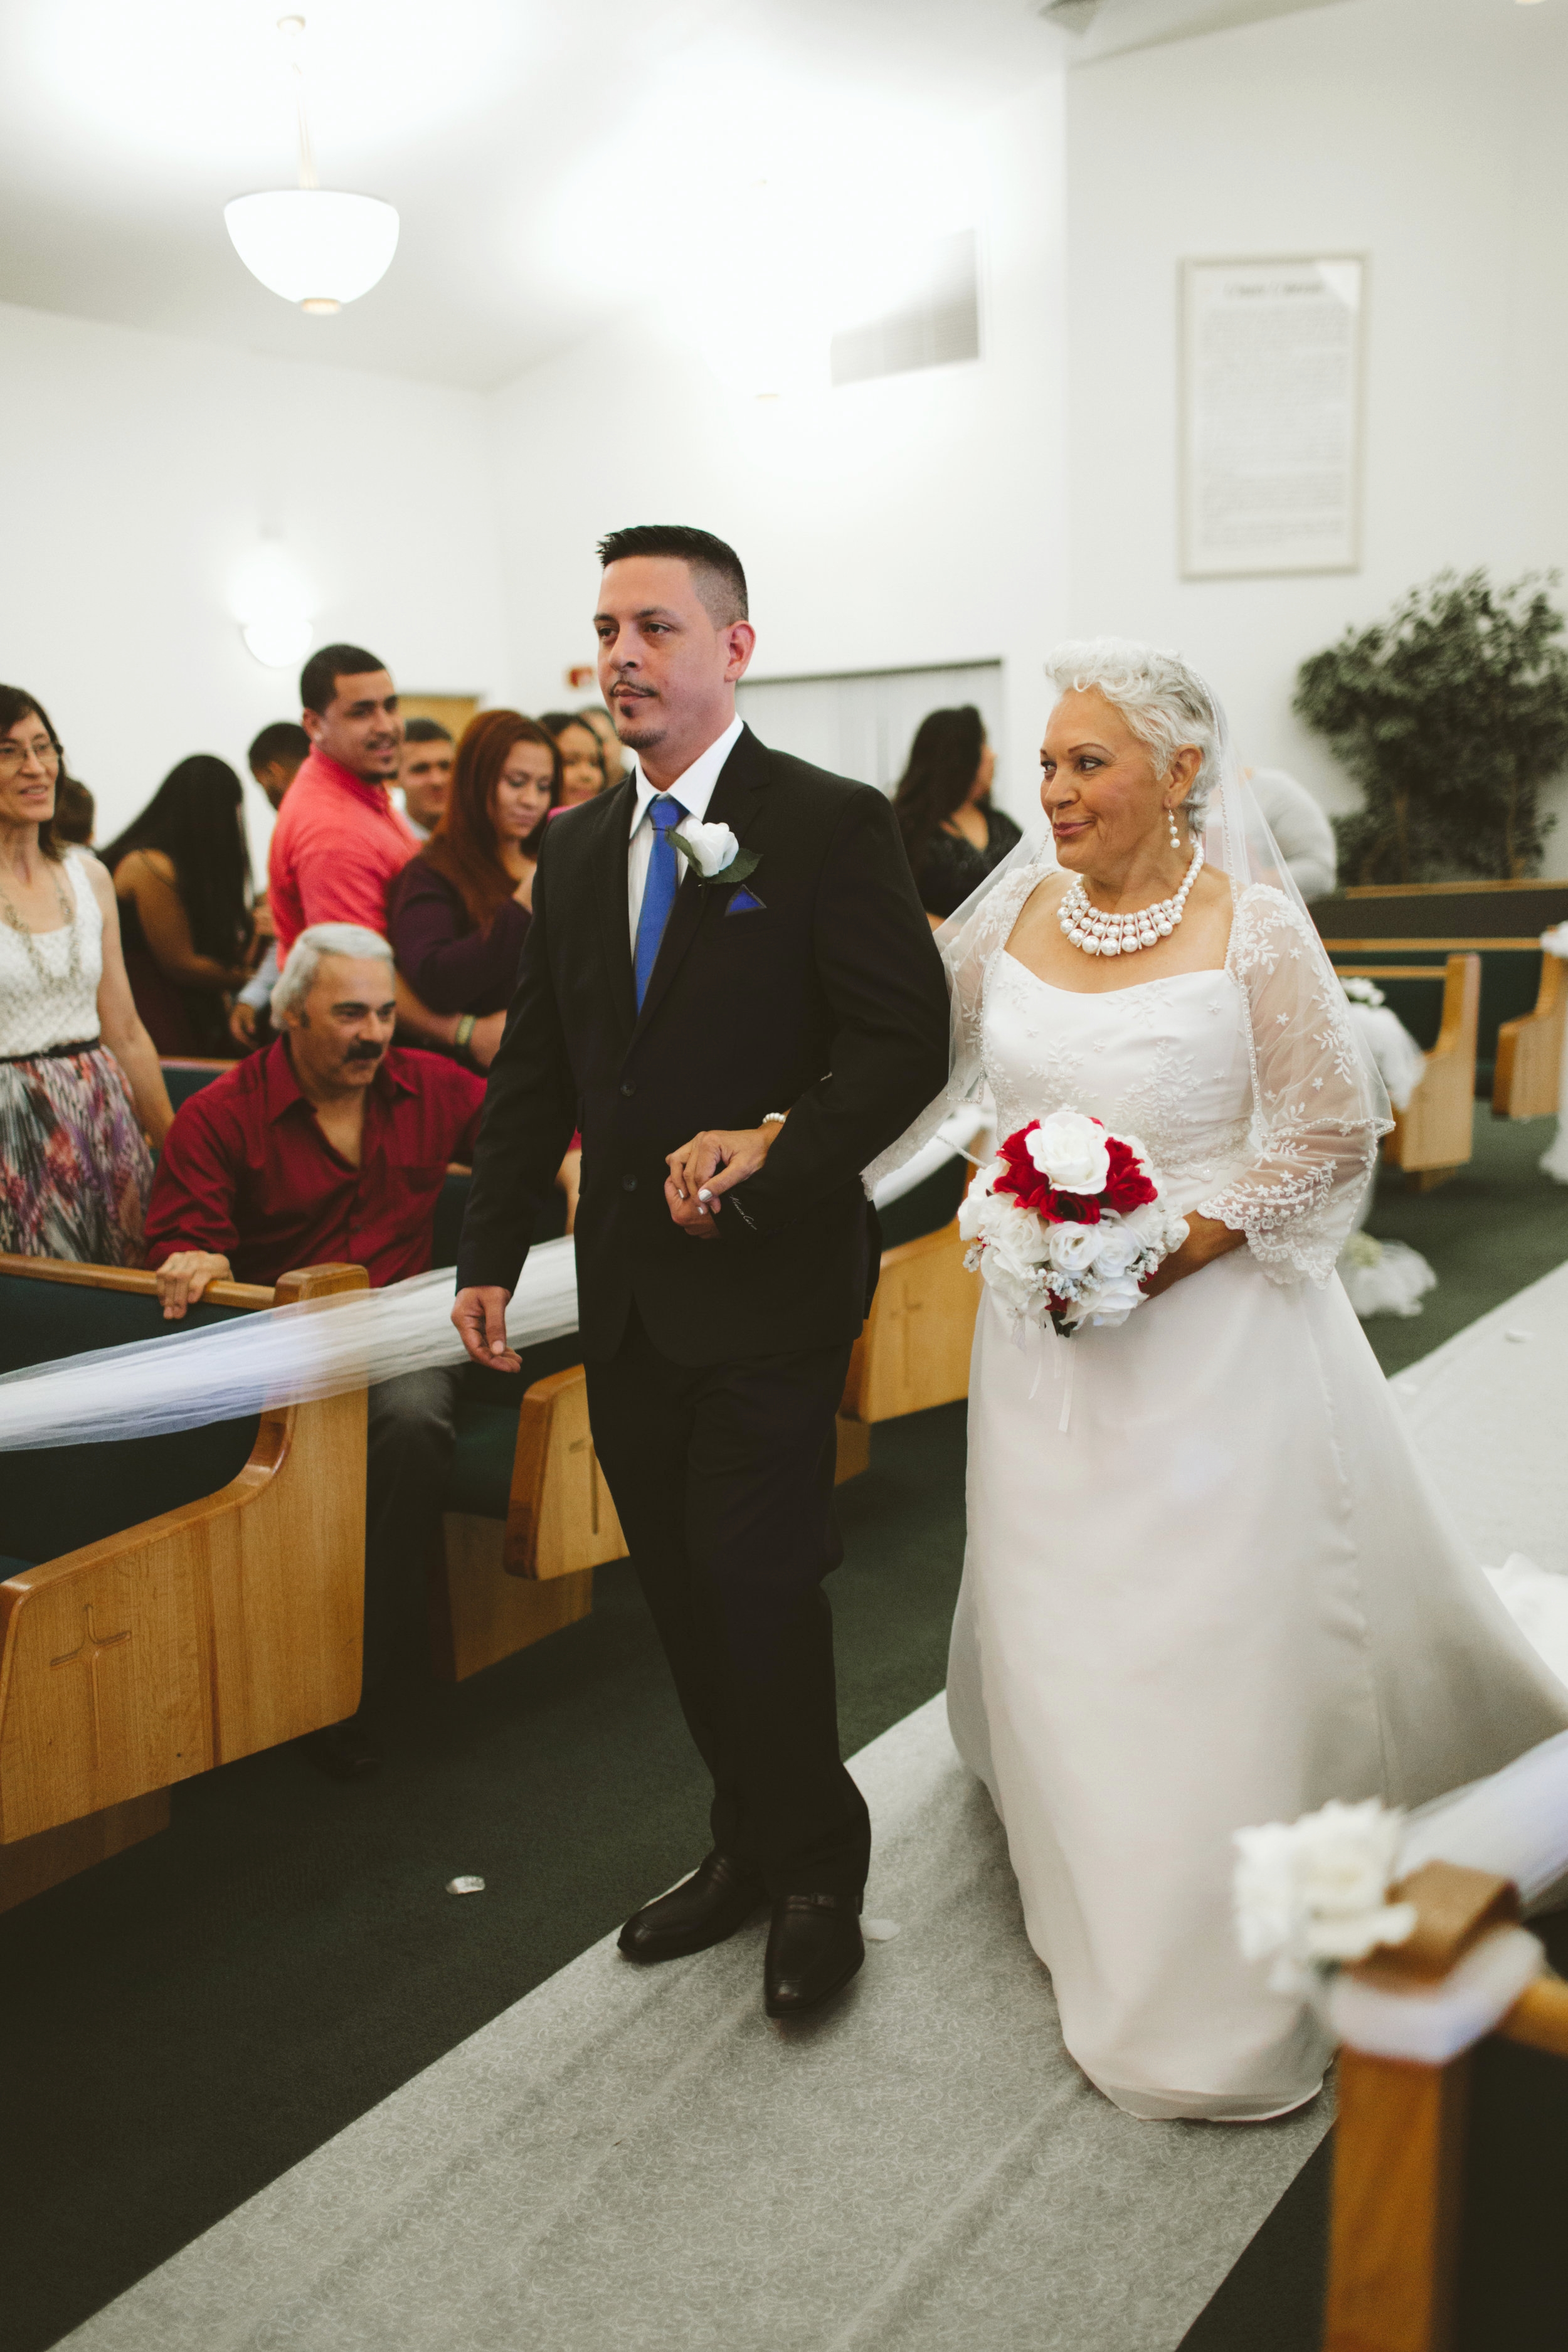 wedding | Vanessa Boy Photography | vanessaboy.com |-106.jpg